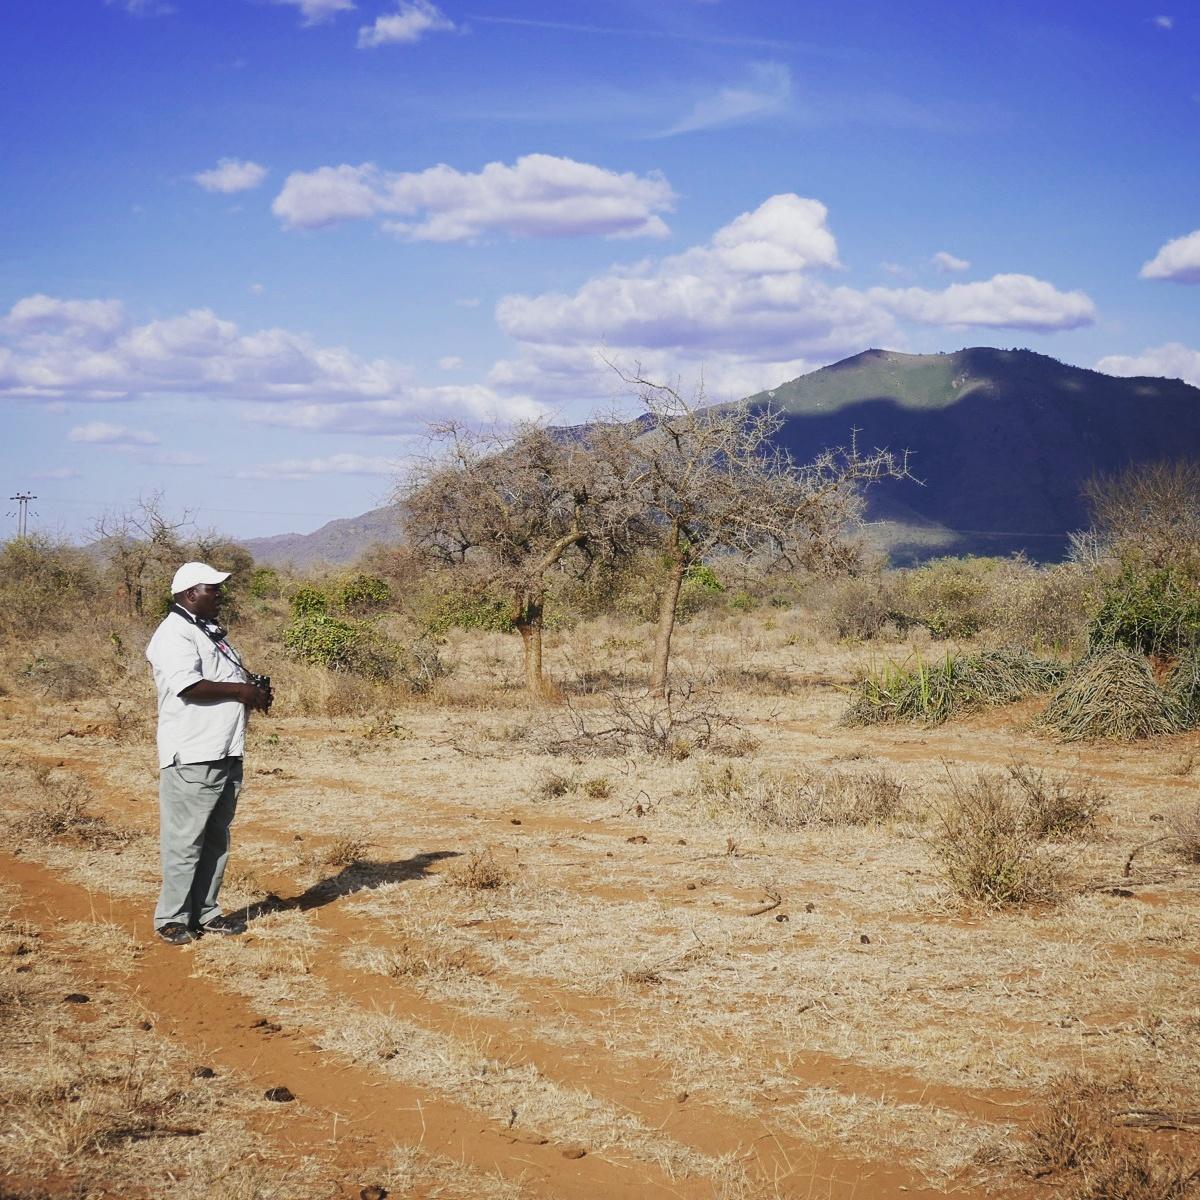 Anthony spots birds at Mkomazi National Park. Noah Strycker